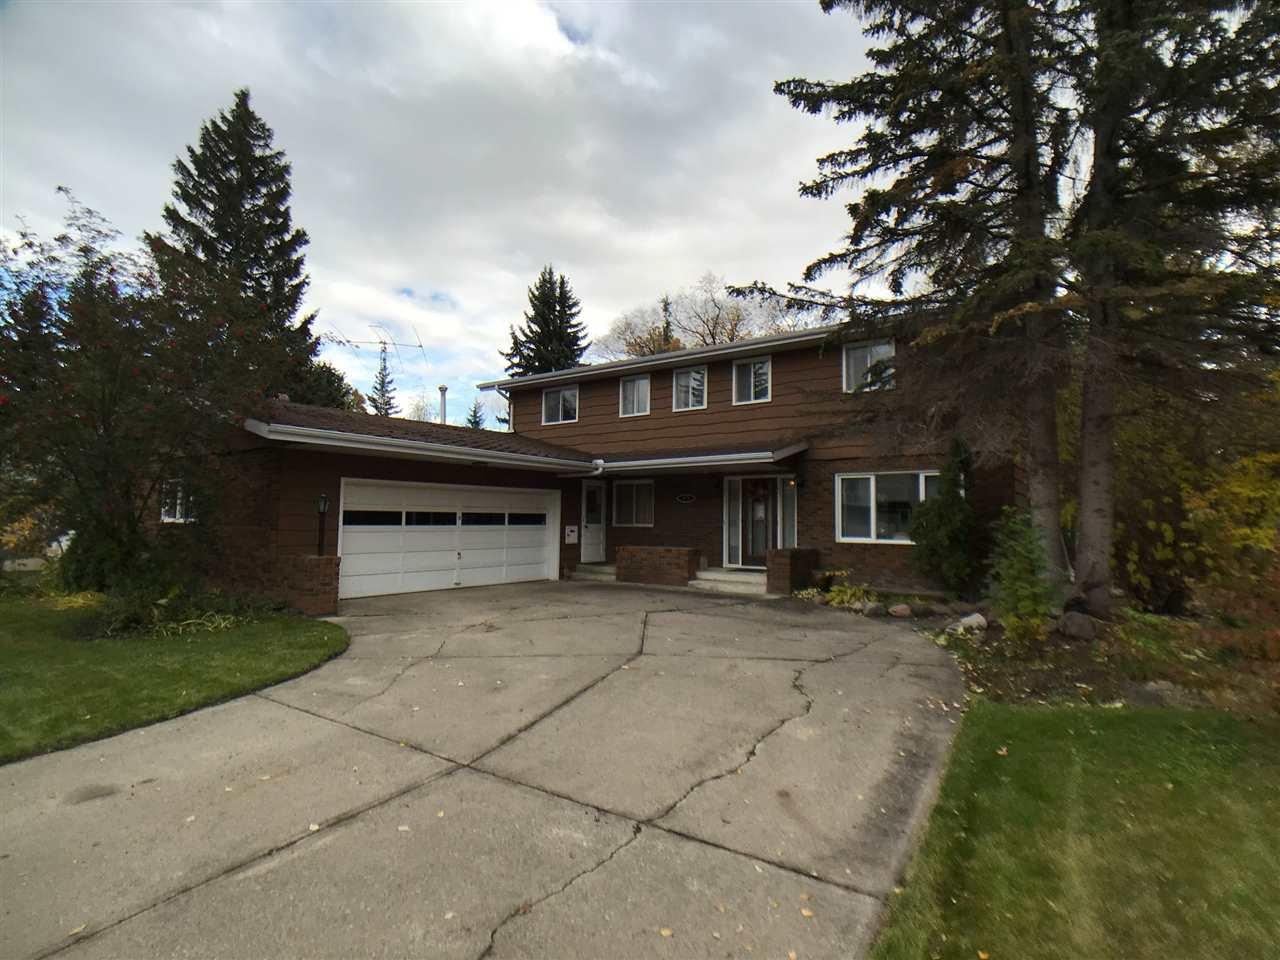 Main Photo: 43 Fairway Drive in Edmonton: Zone 16 House for sale : MLS®# E4189110